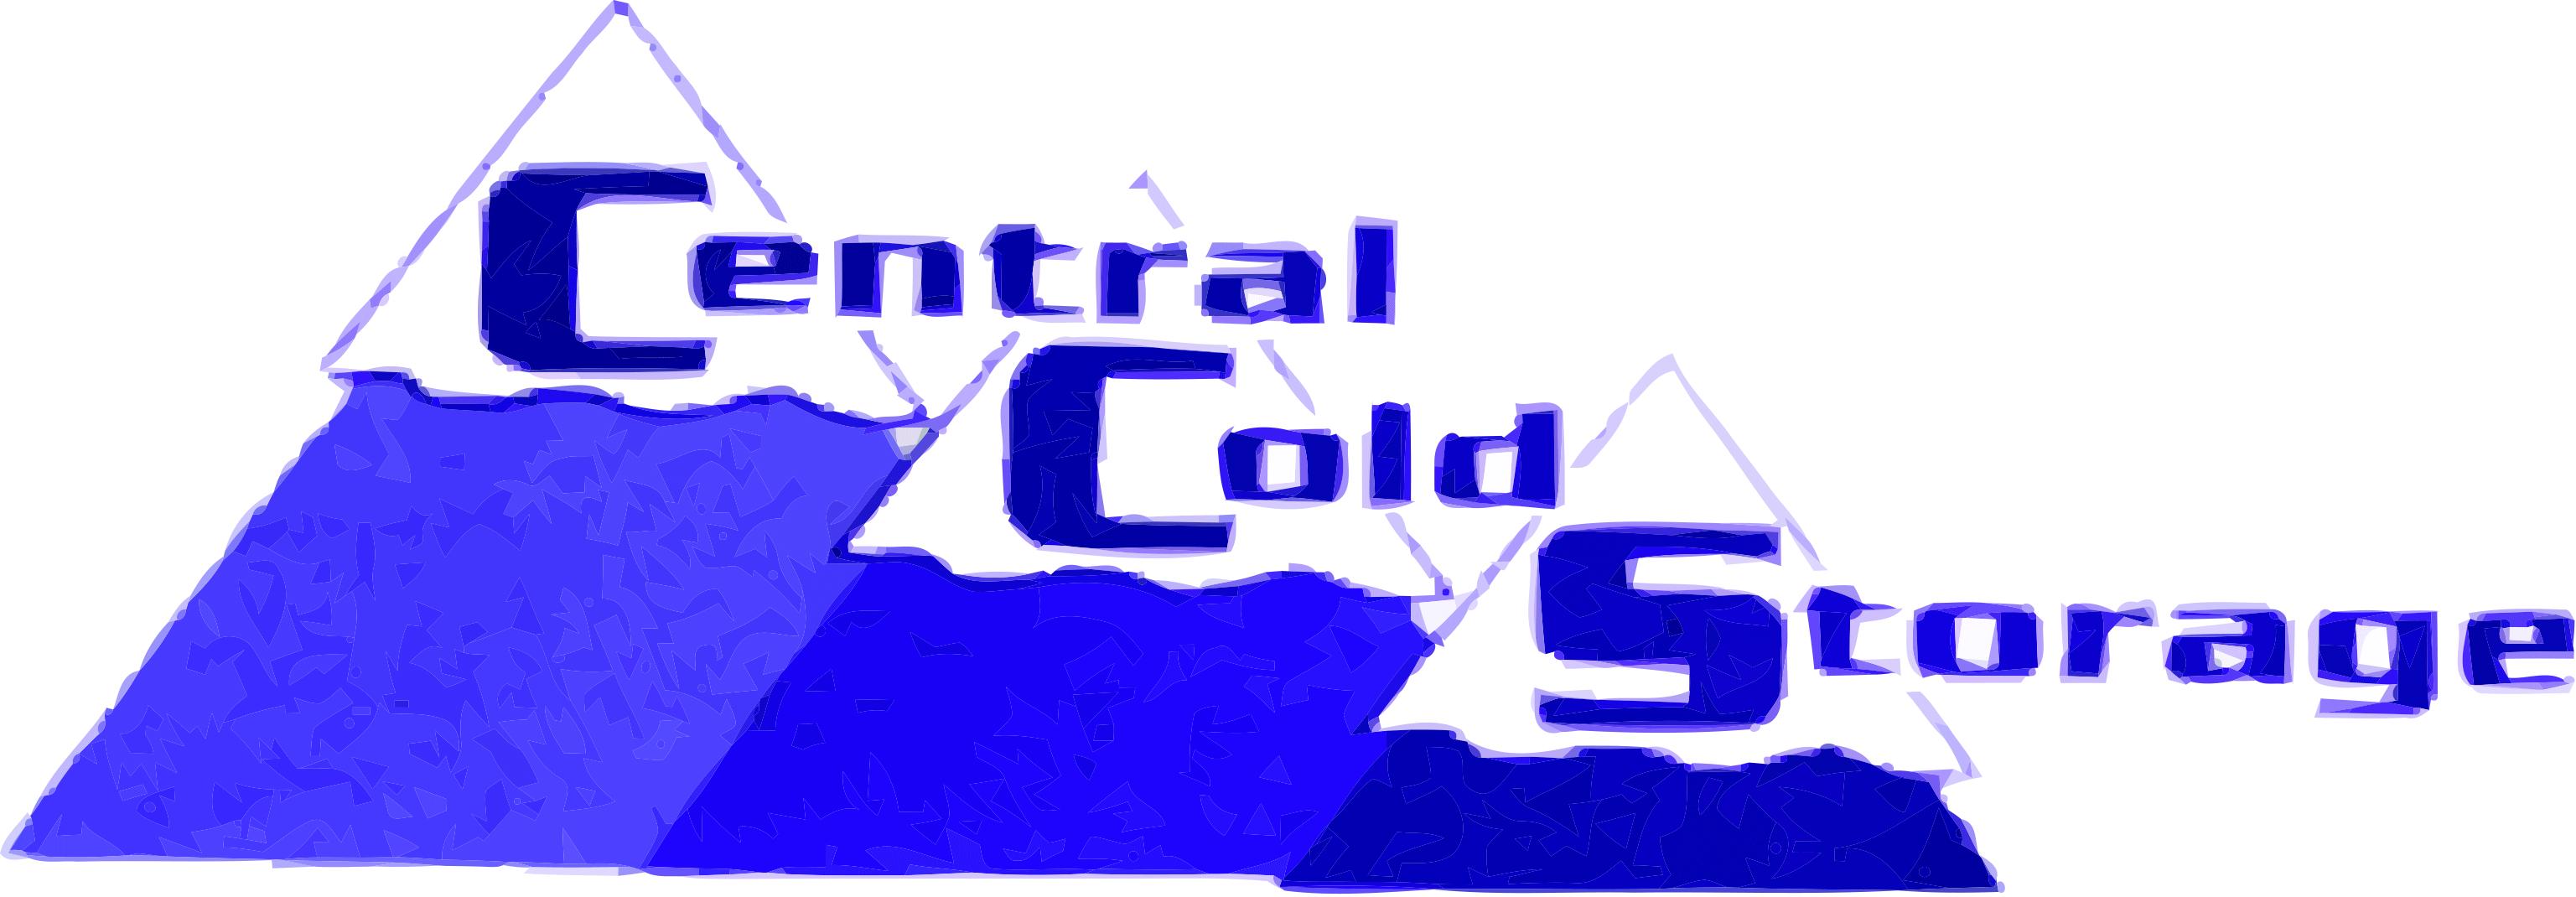 Logo Central Cold Storage  sc 1 st  Frozen-Goods.com & Logo Central Cold Storage - Frozen-Goods.com